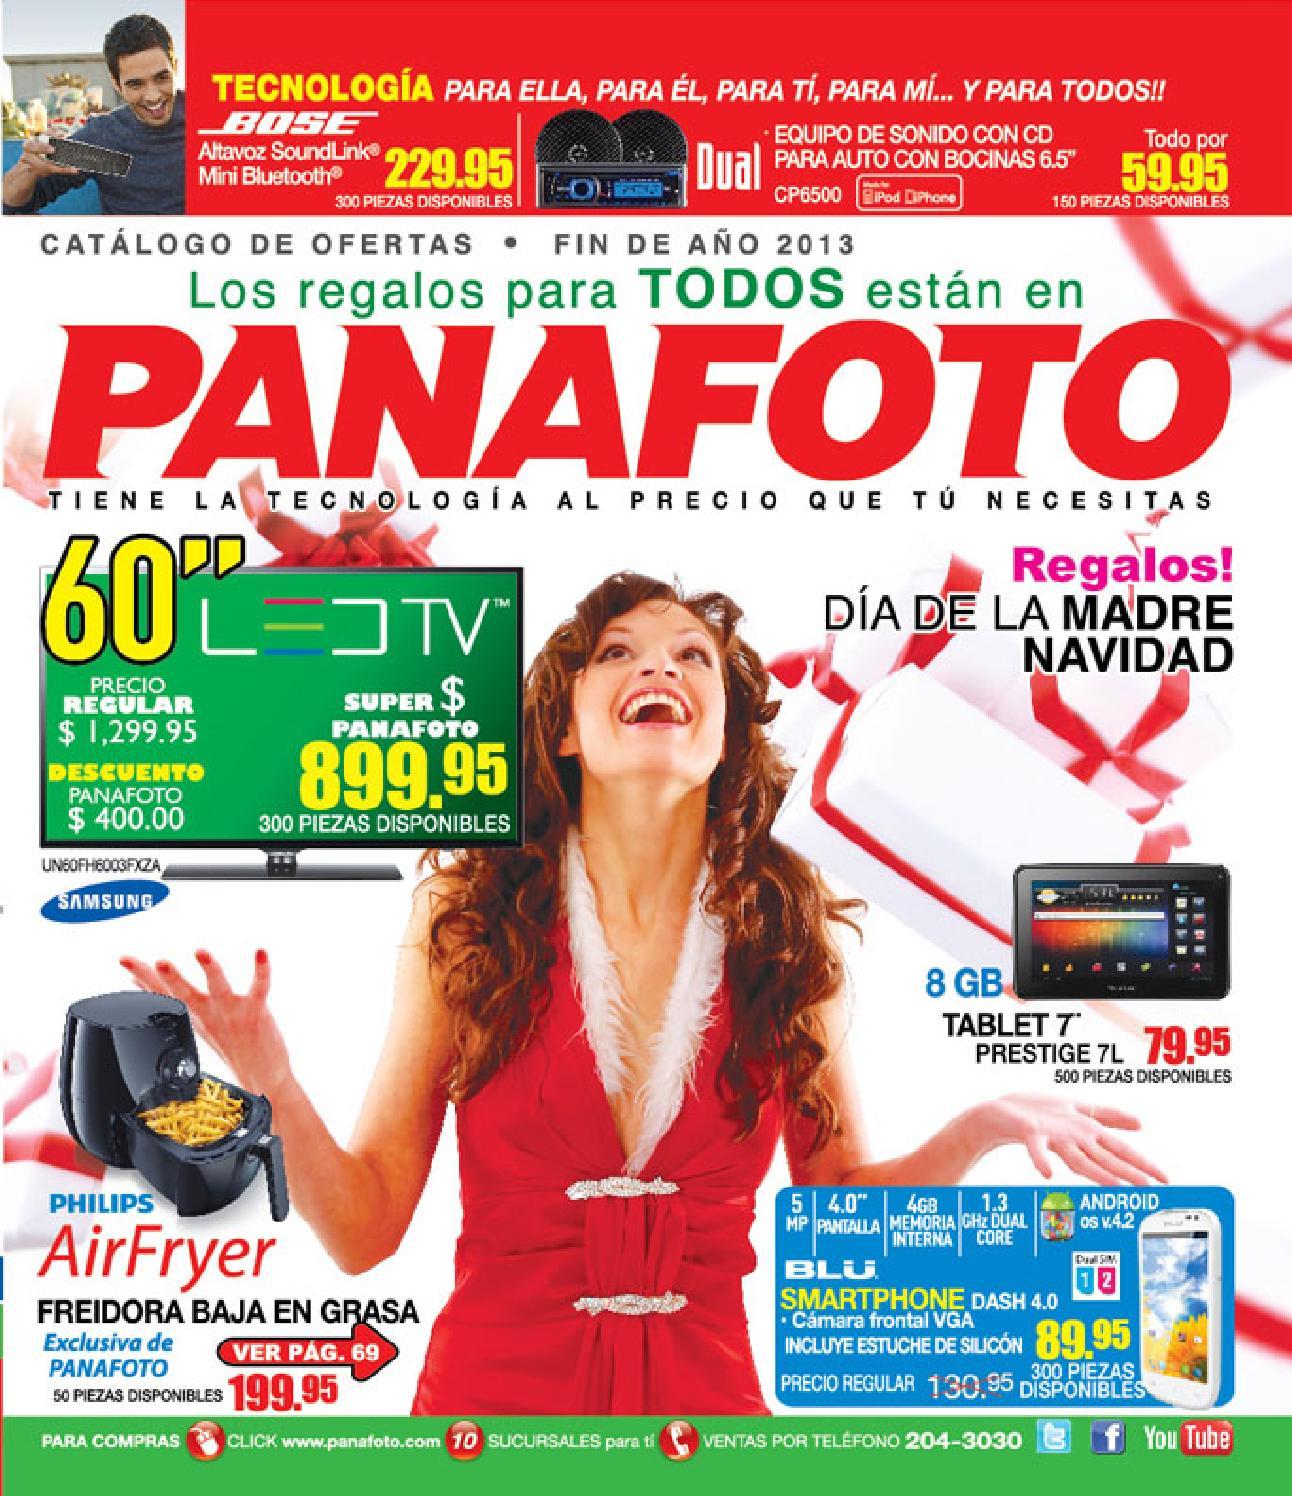 Catalogo panafoto diciembre 2013 by interiores estilo - Catalogo de ofertas de merkamueble ...